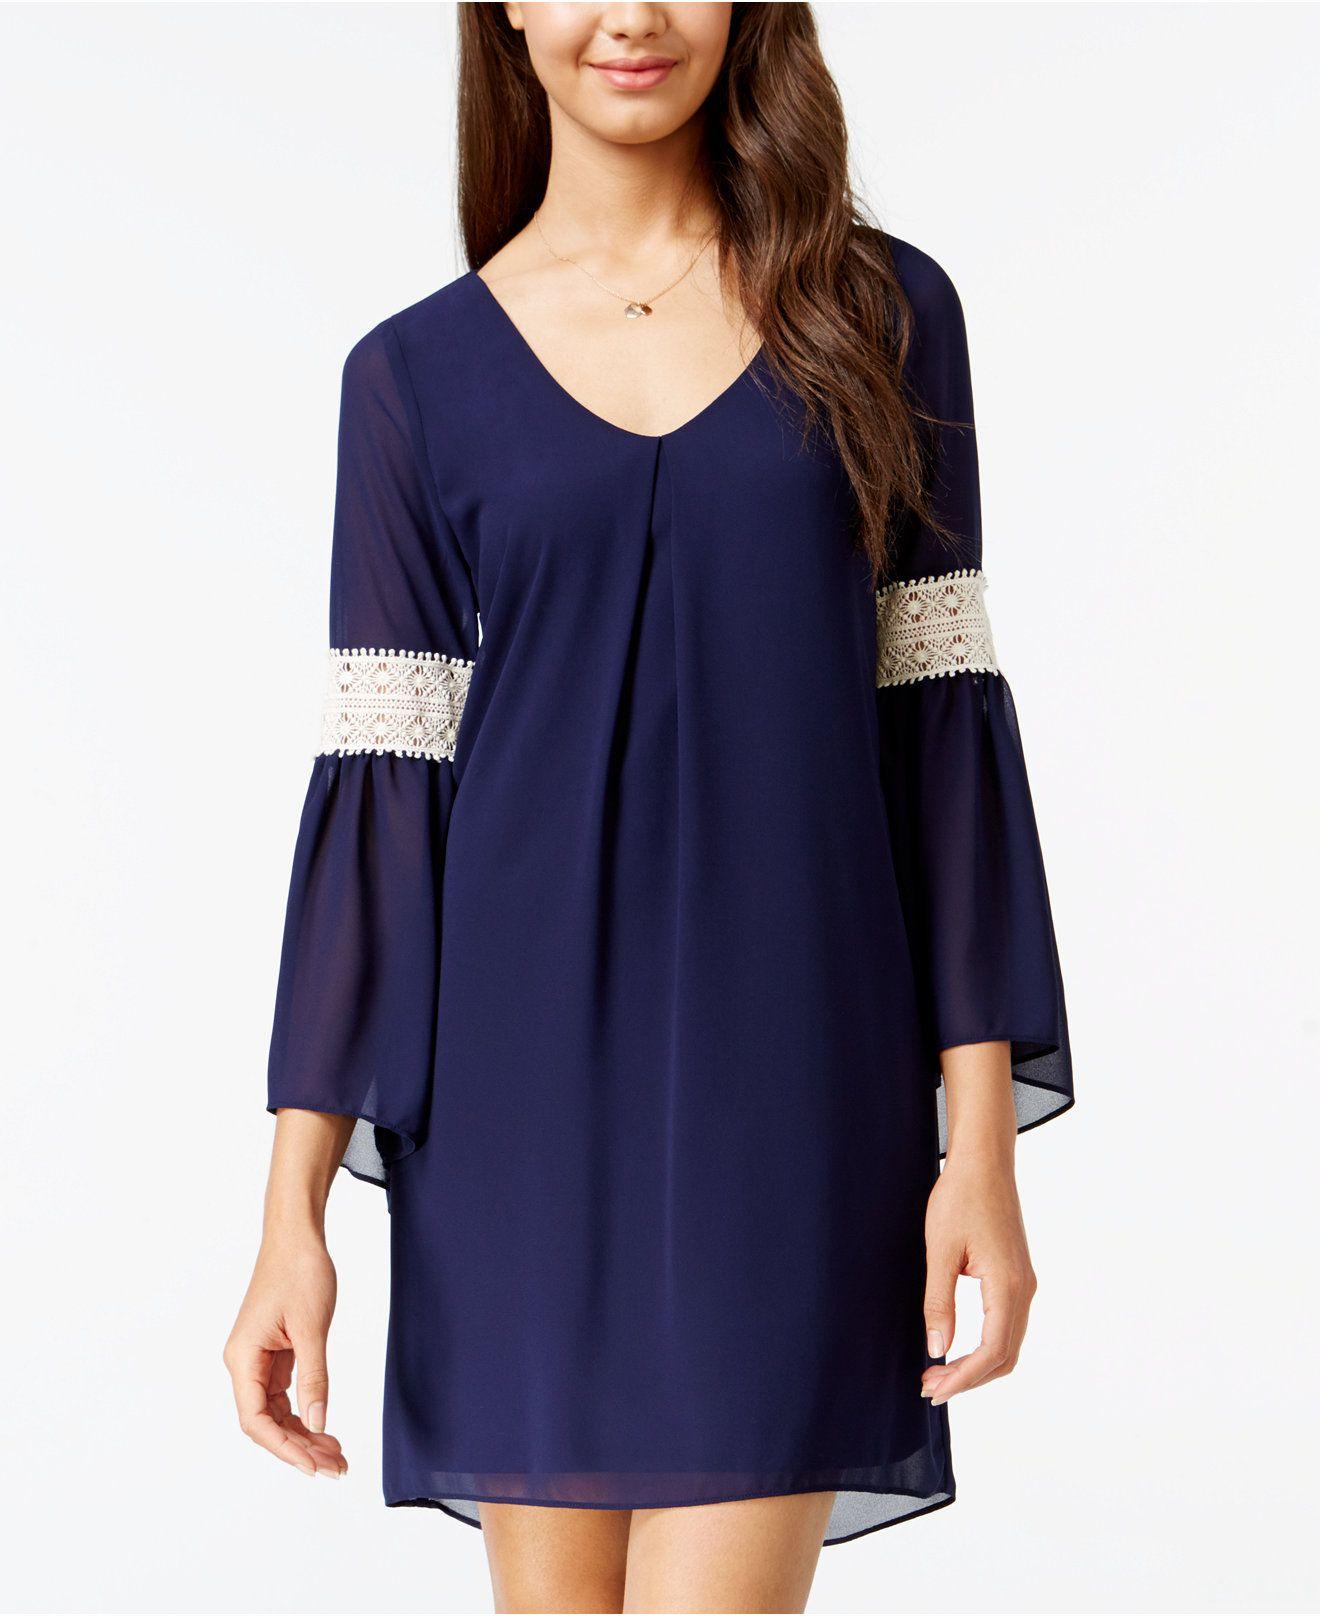 d19b8cbfc57 BCX Juniors  Lace-Trim Bell-Sleeve Shift Dress - Juniors Dresses - Macy s